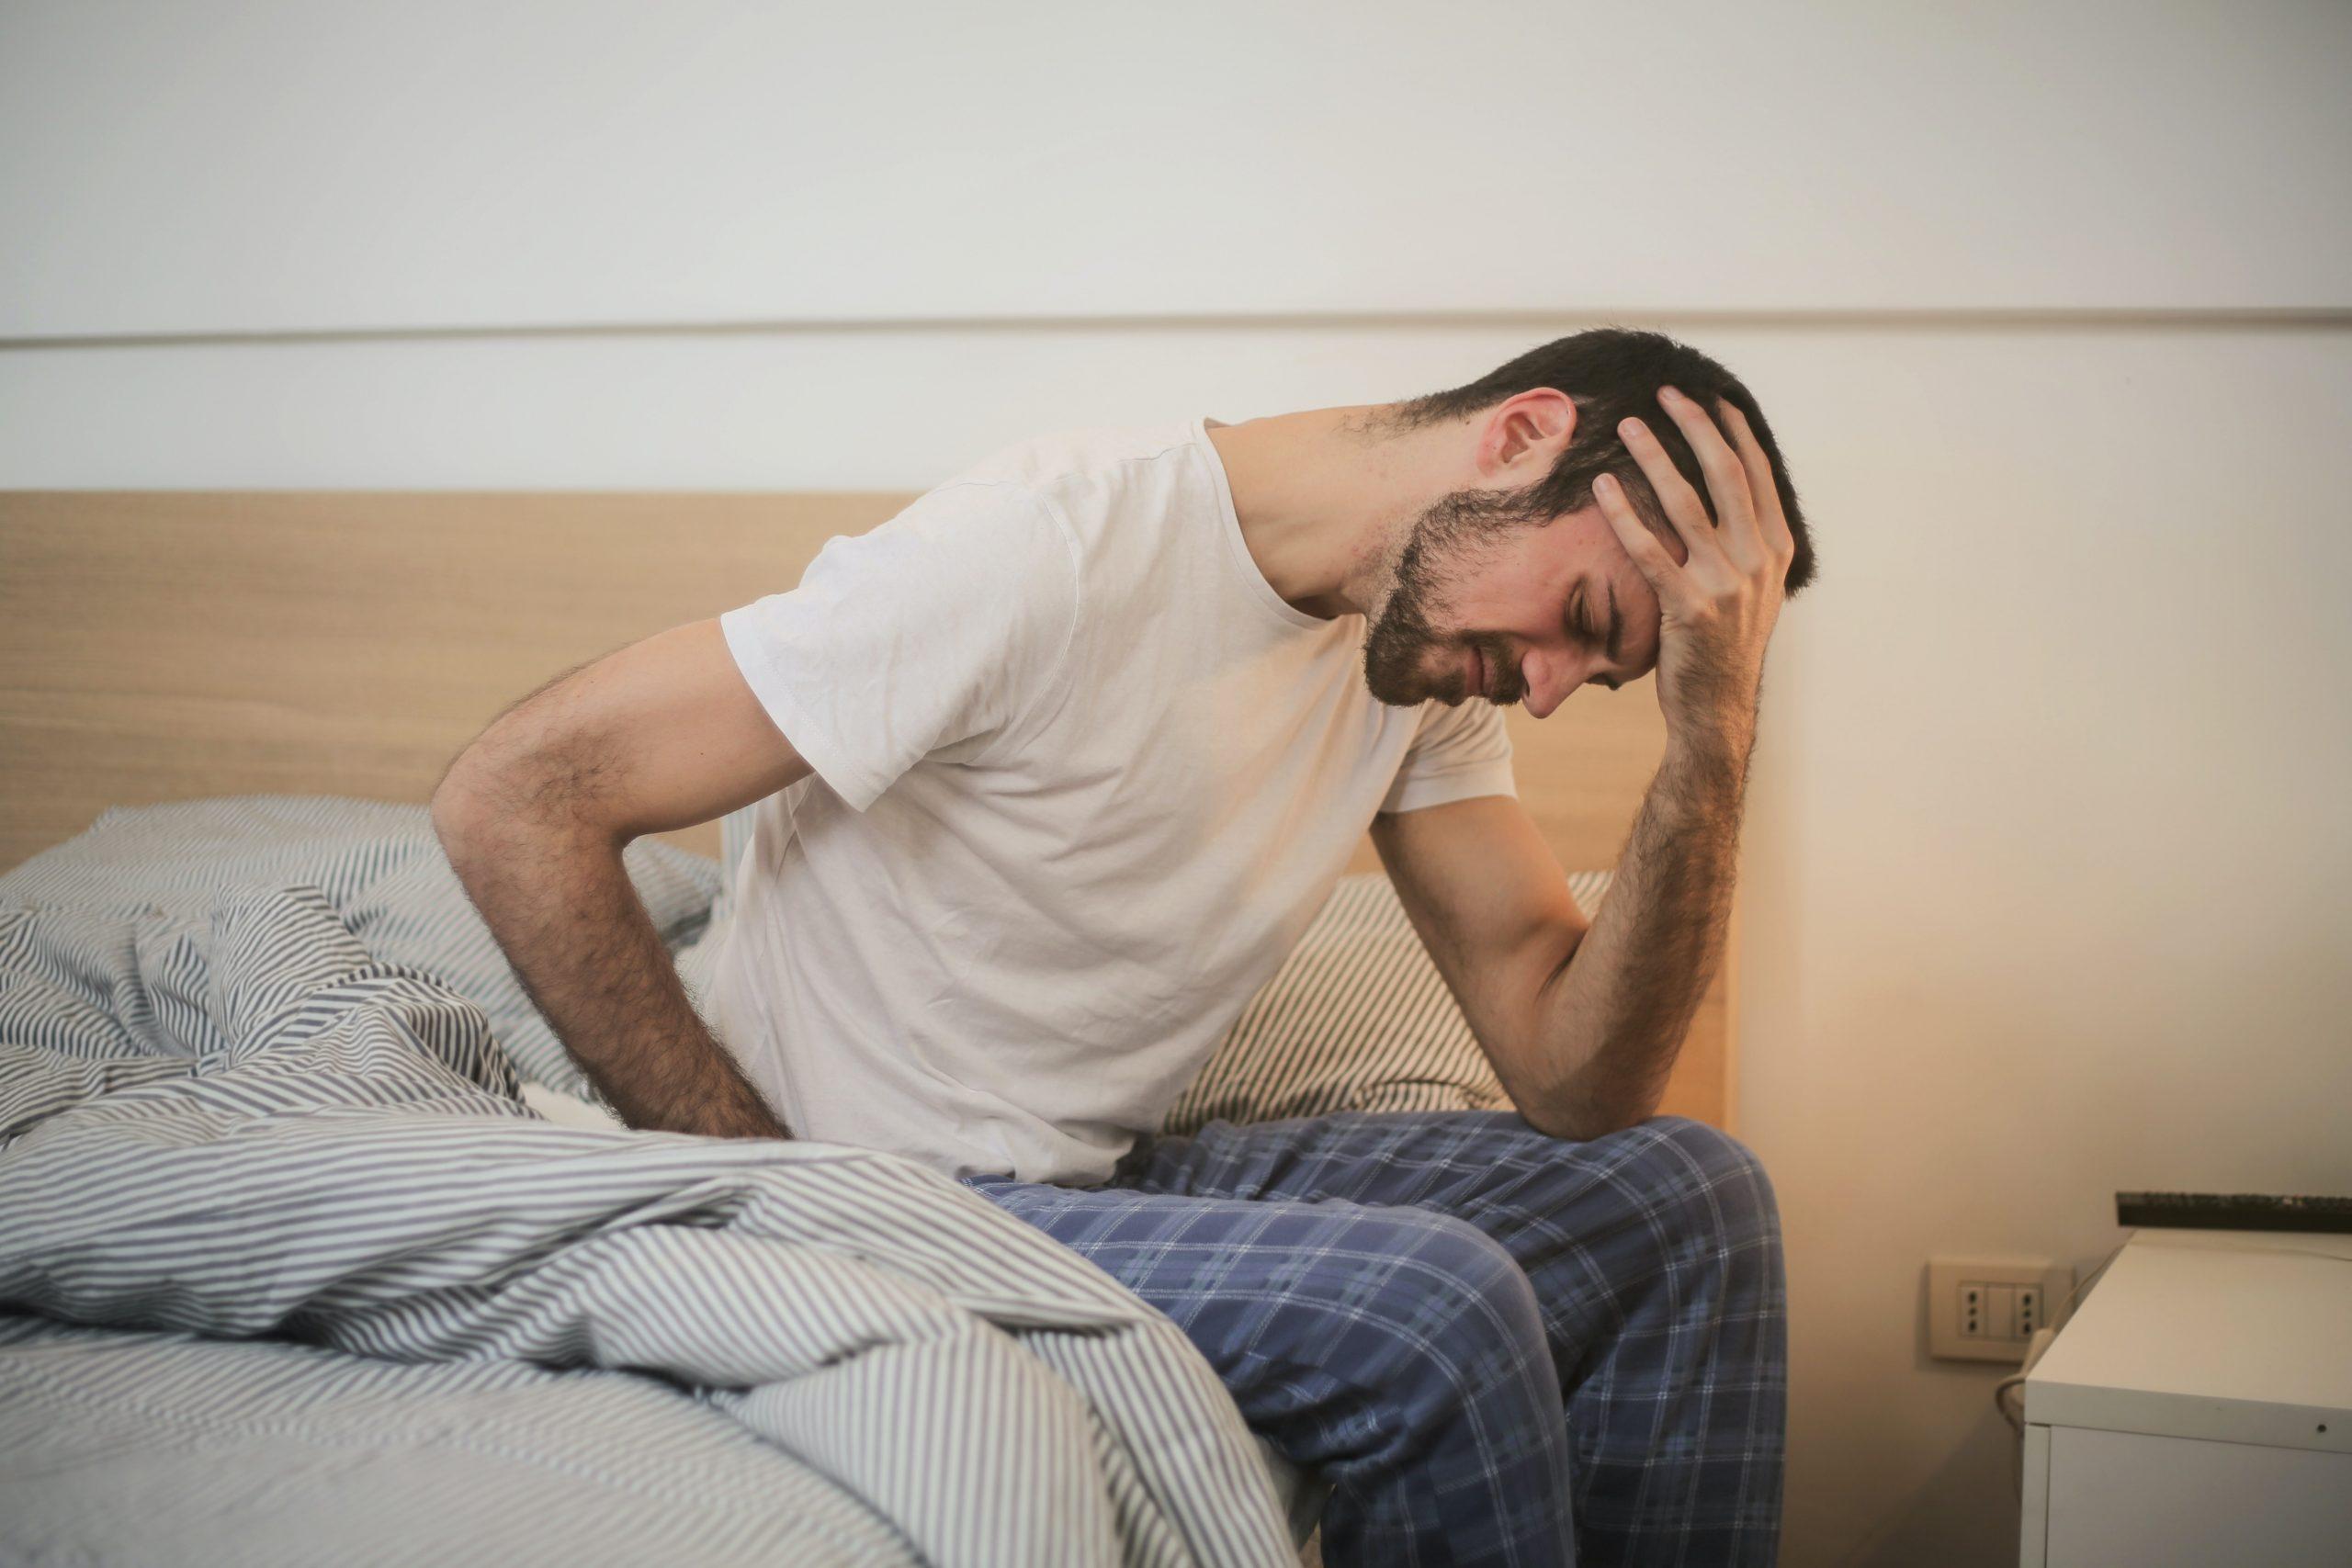 alcohol rehab may improve gastrointestinal pain